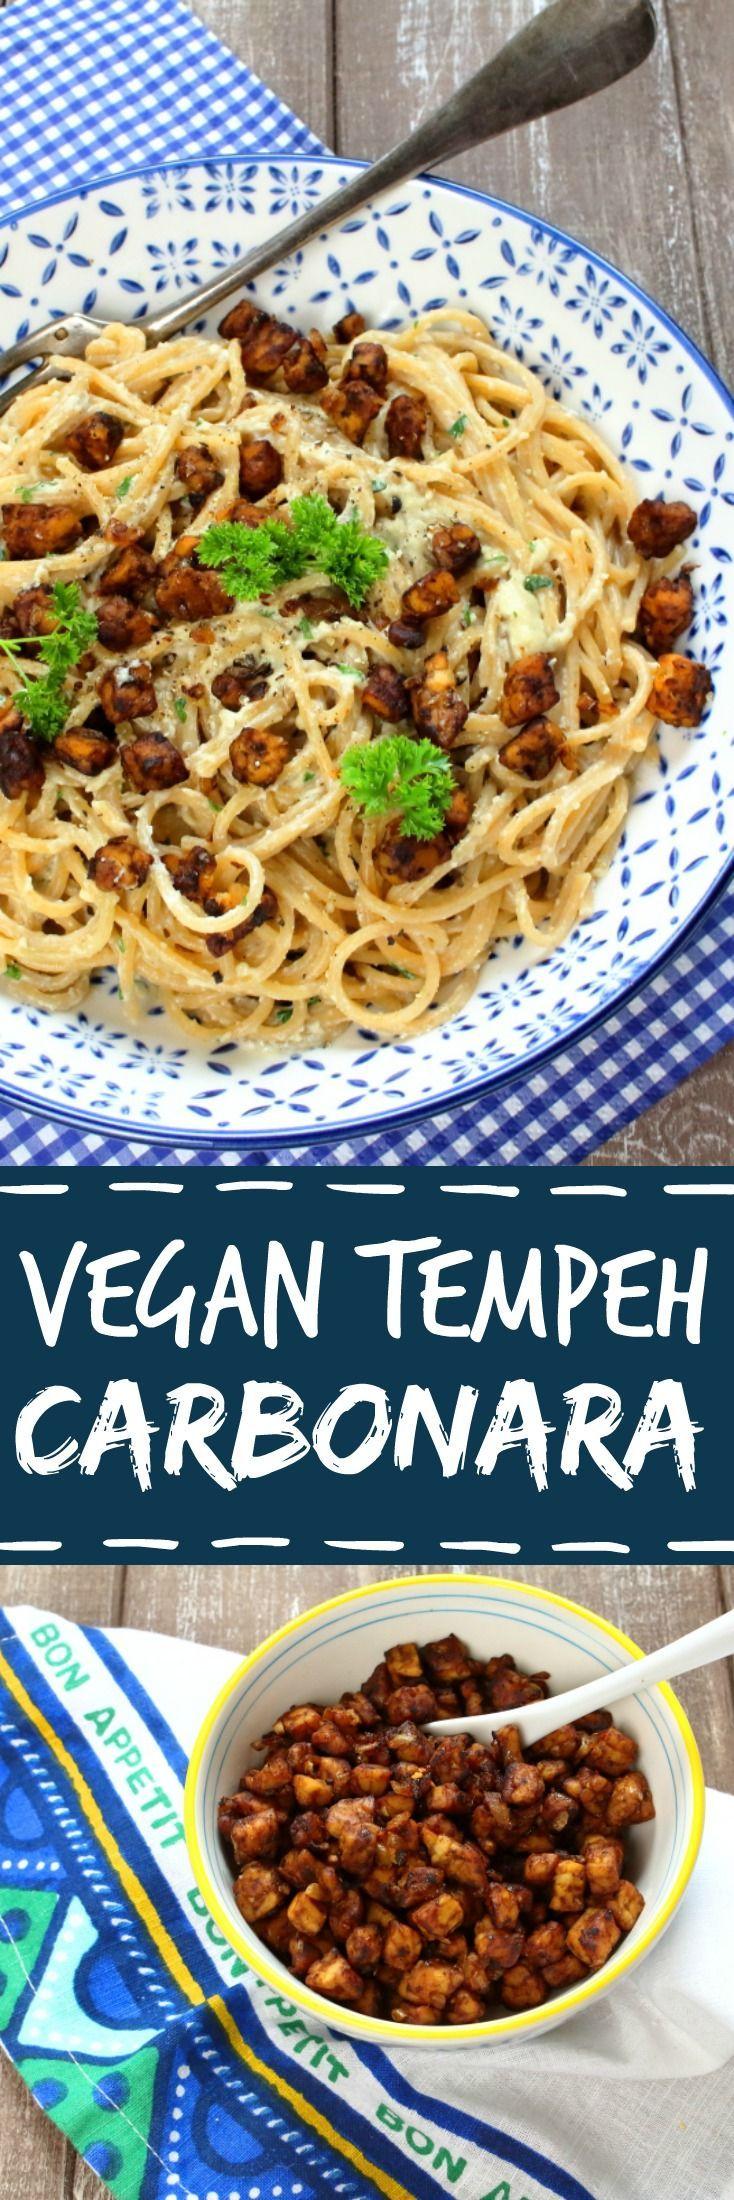 Vegan Tempeh Carbonara with Spaghetti. Super creamy and crispy! Make with spaghetti squash instead of pasta